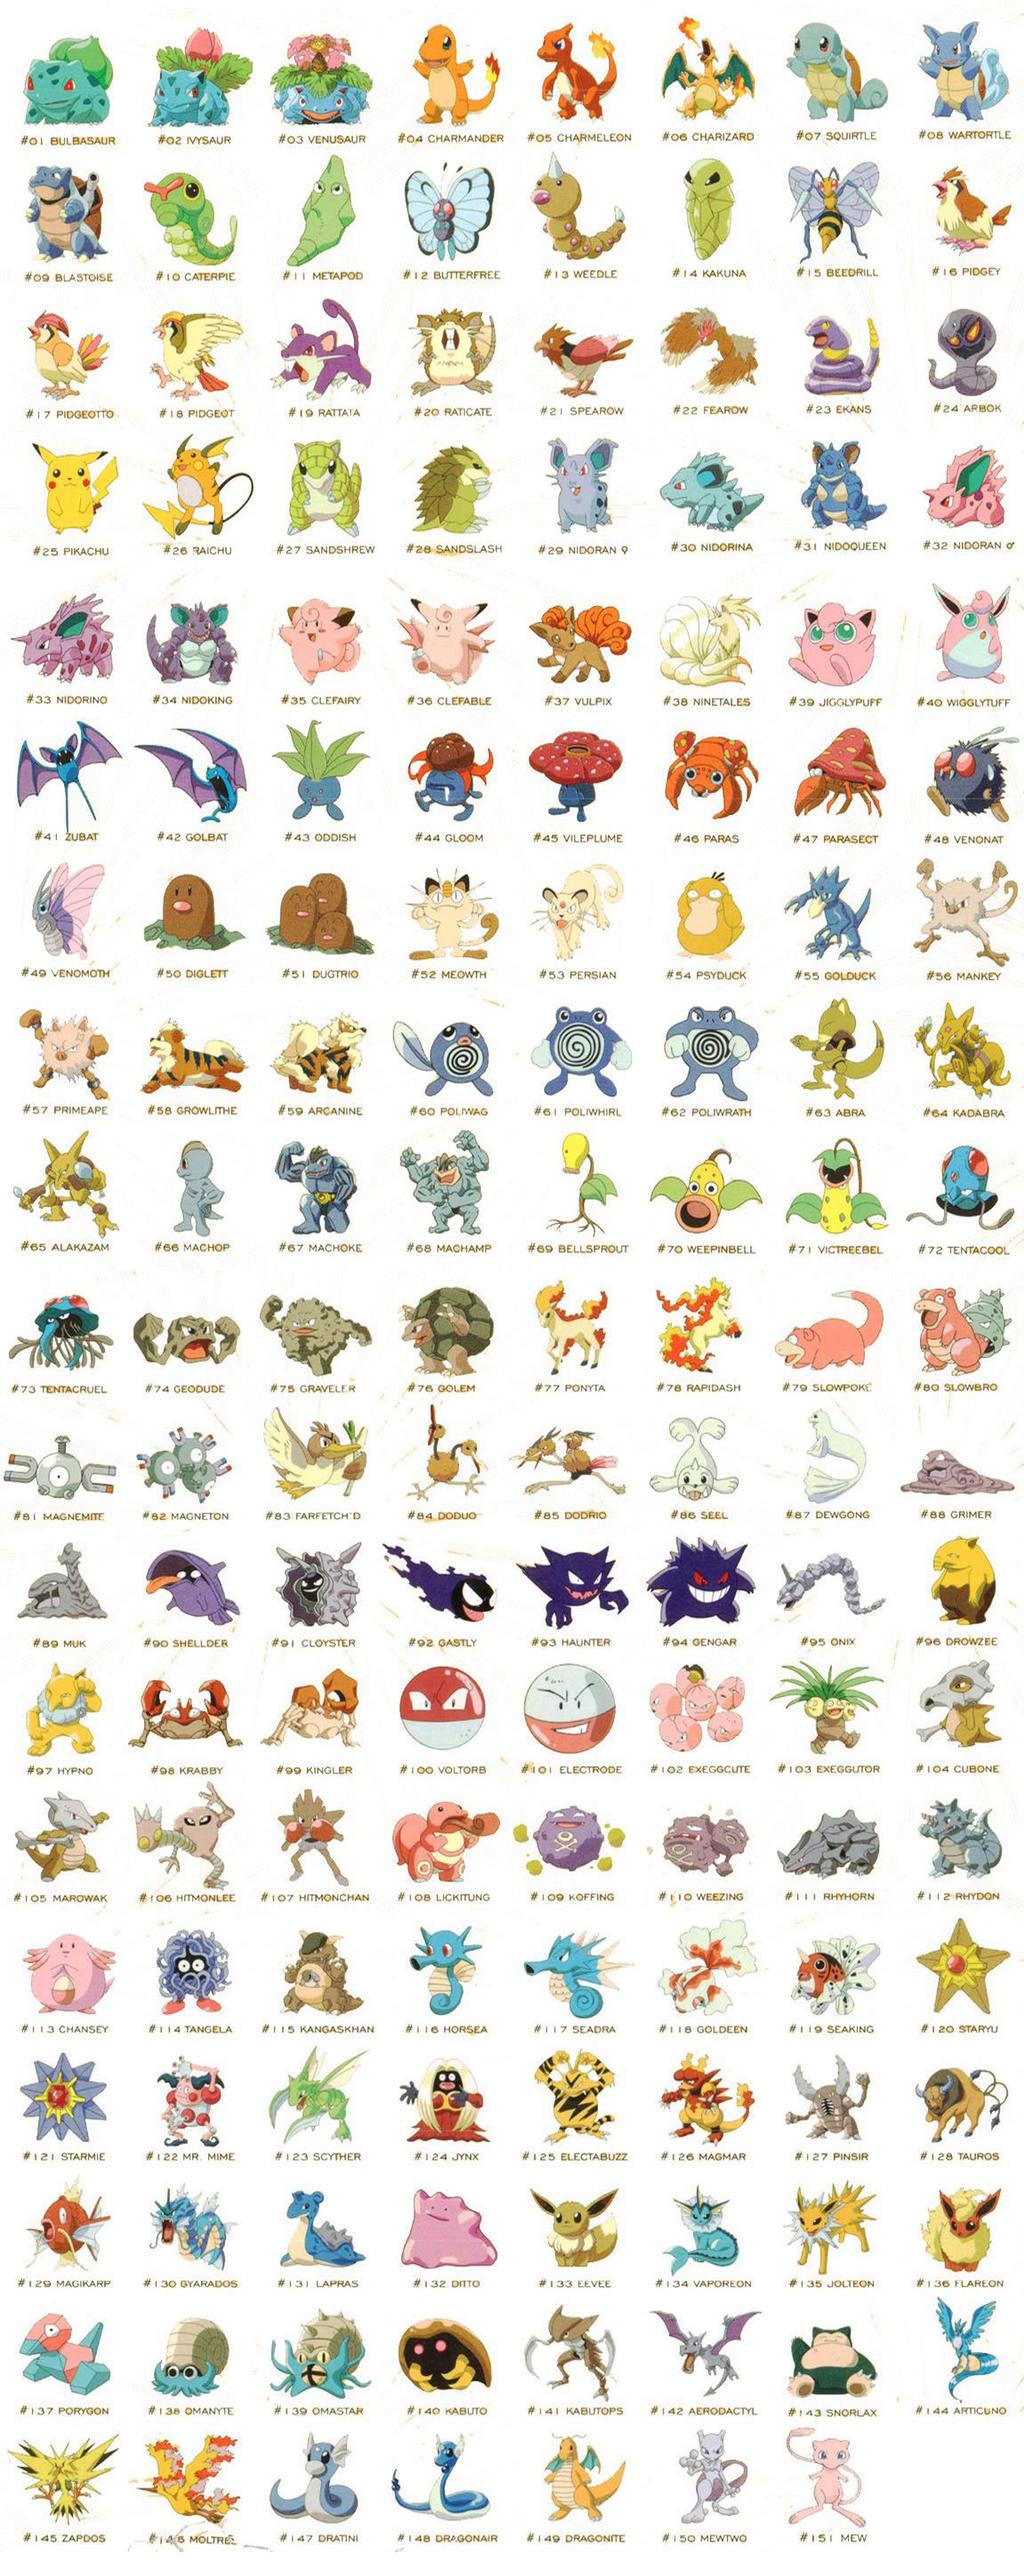 150 pokemon by angerox on deviantart